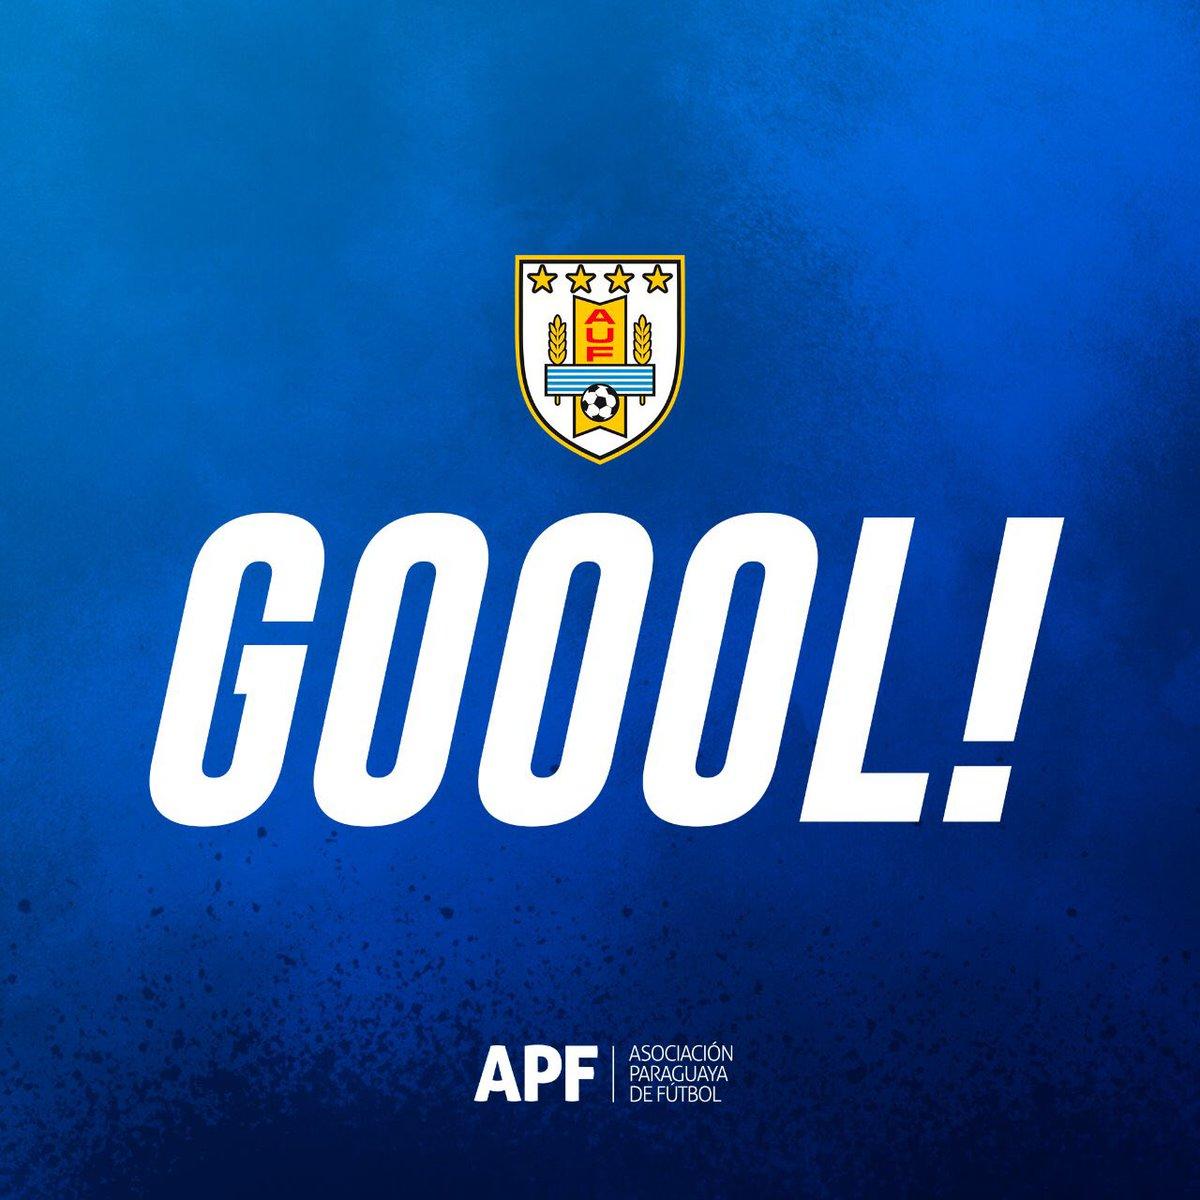 #FutsalAPF #AlbirrojaFutsalFIFA  #AmistosoInternacional   🗓Partido de Vuelta.   ⌛️5' ST | GOOOOLLL de Uruguay, Yhordi Seguí pone en ventaja a los uruguayos.   🇵🇾 #Paraguay (2) - #Uruguay🇺🇾 (3).  #VamosParaguay